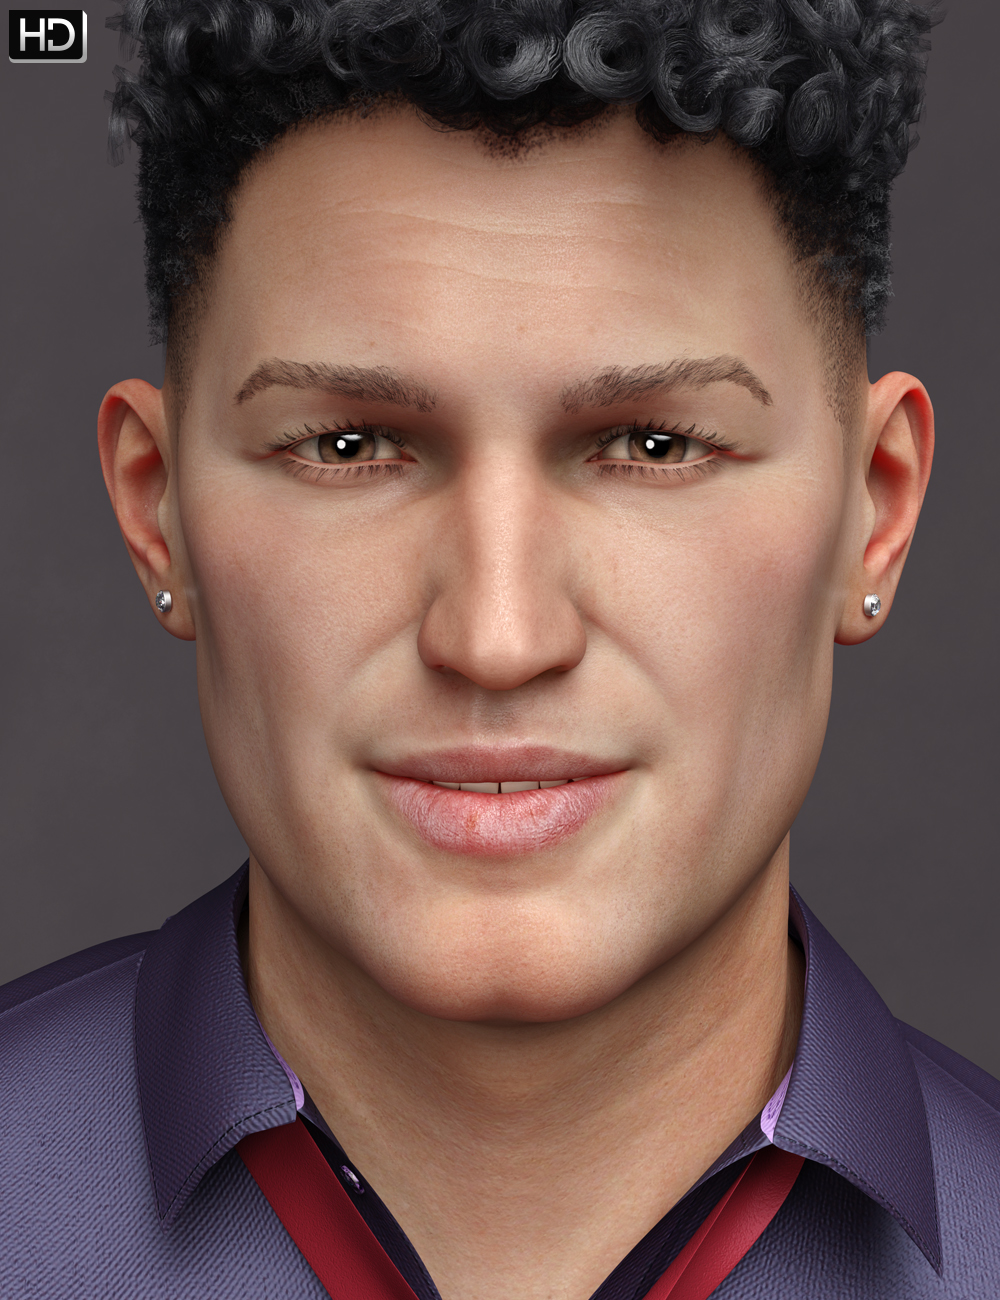 Curtis HD for Genesis 8 Male by: Emrys, 3D Models by Daz 3D